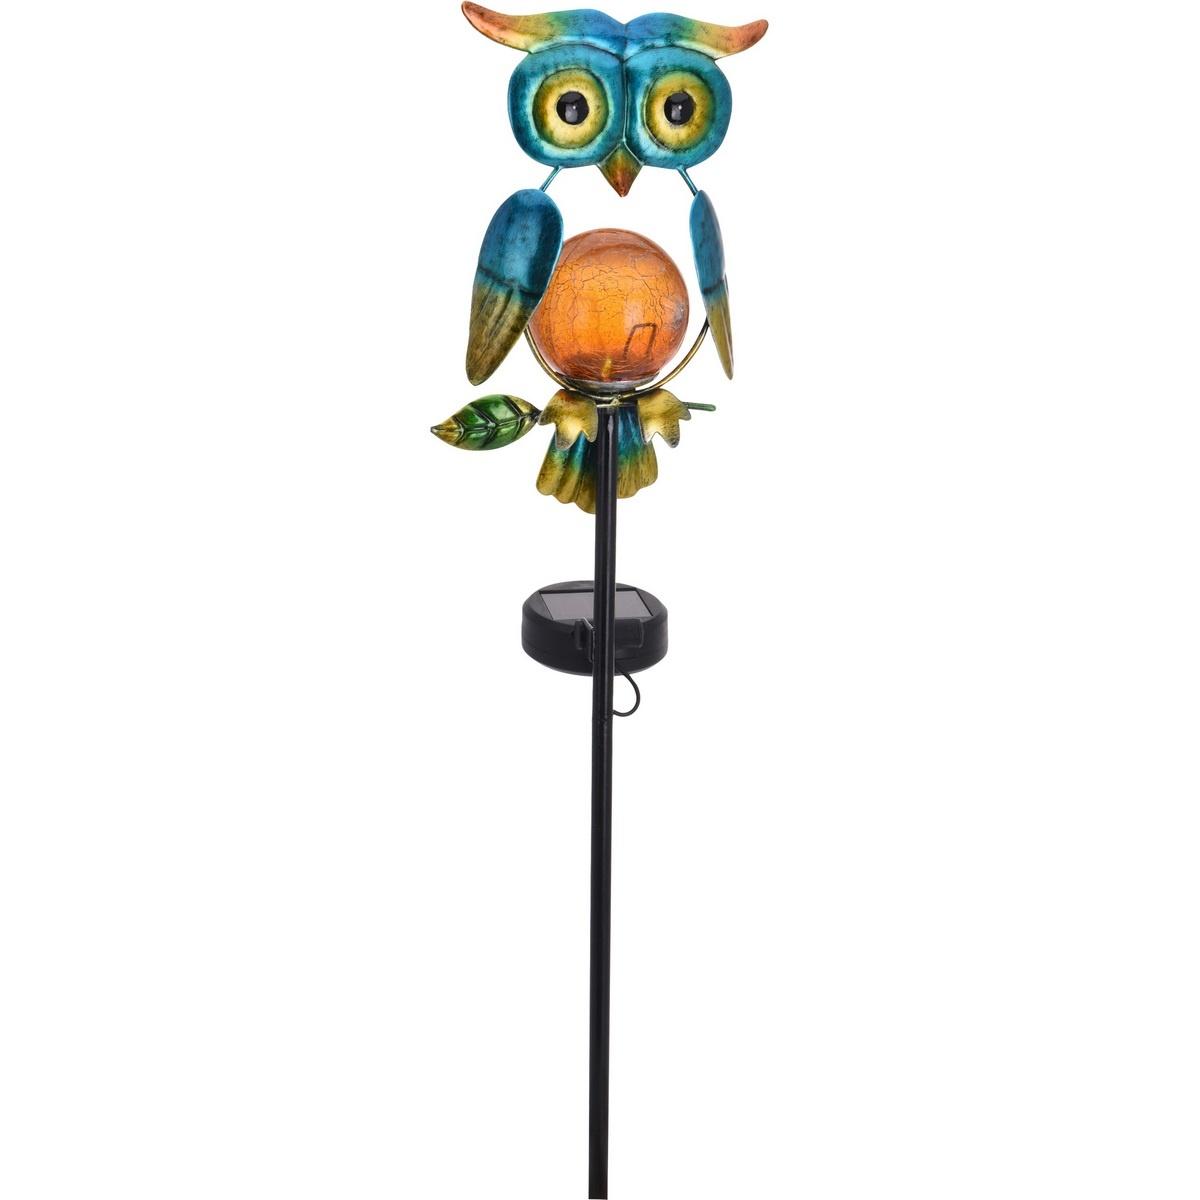 Solární lampa Owl modrá, 12 x 6 x 54 cm